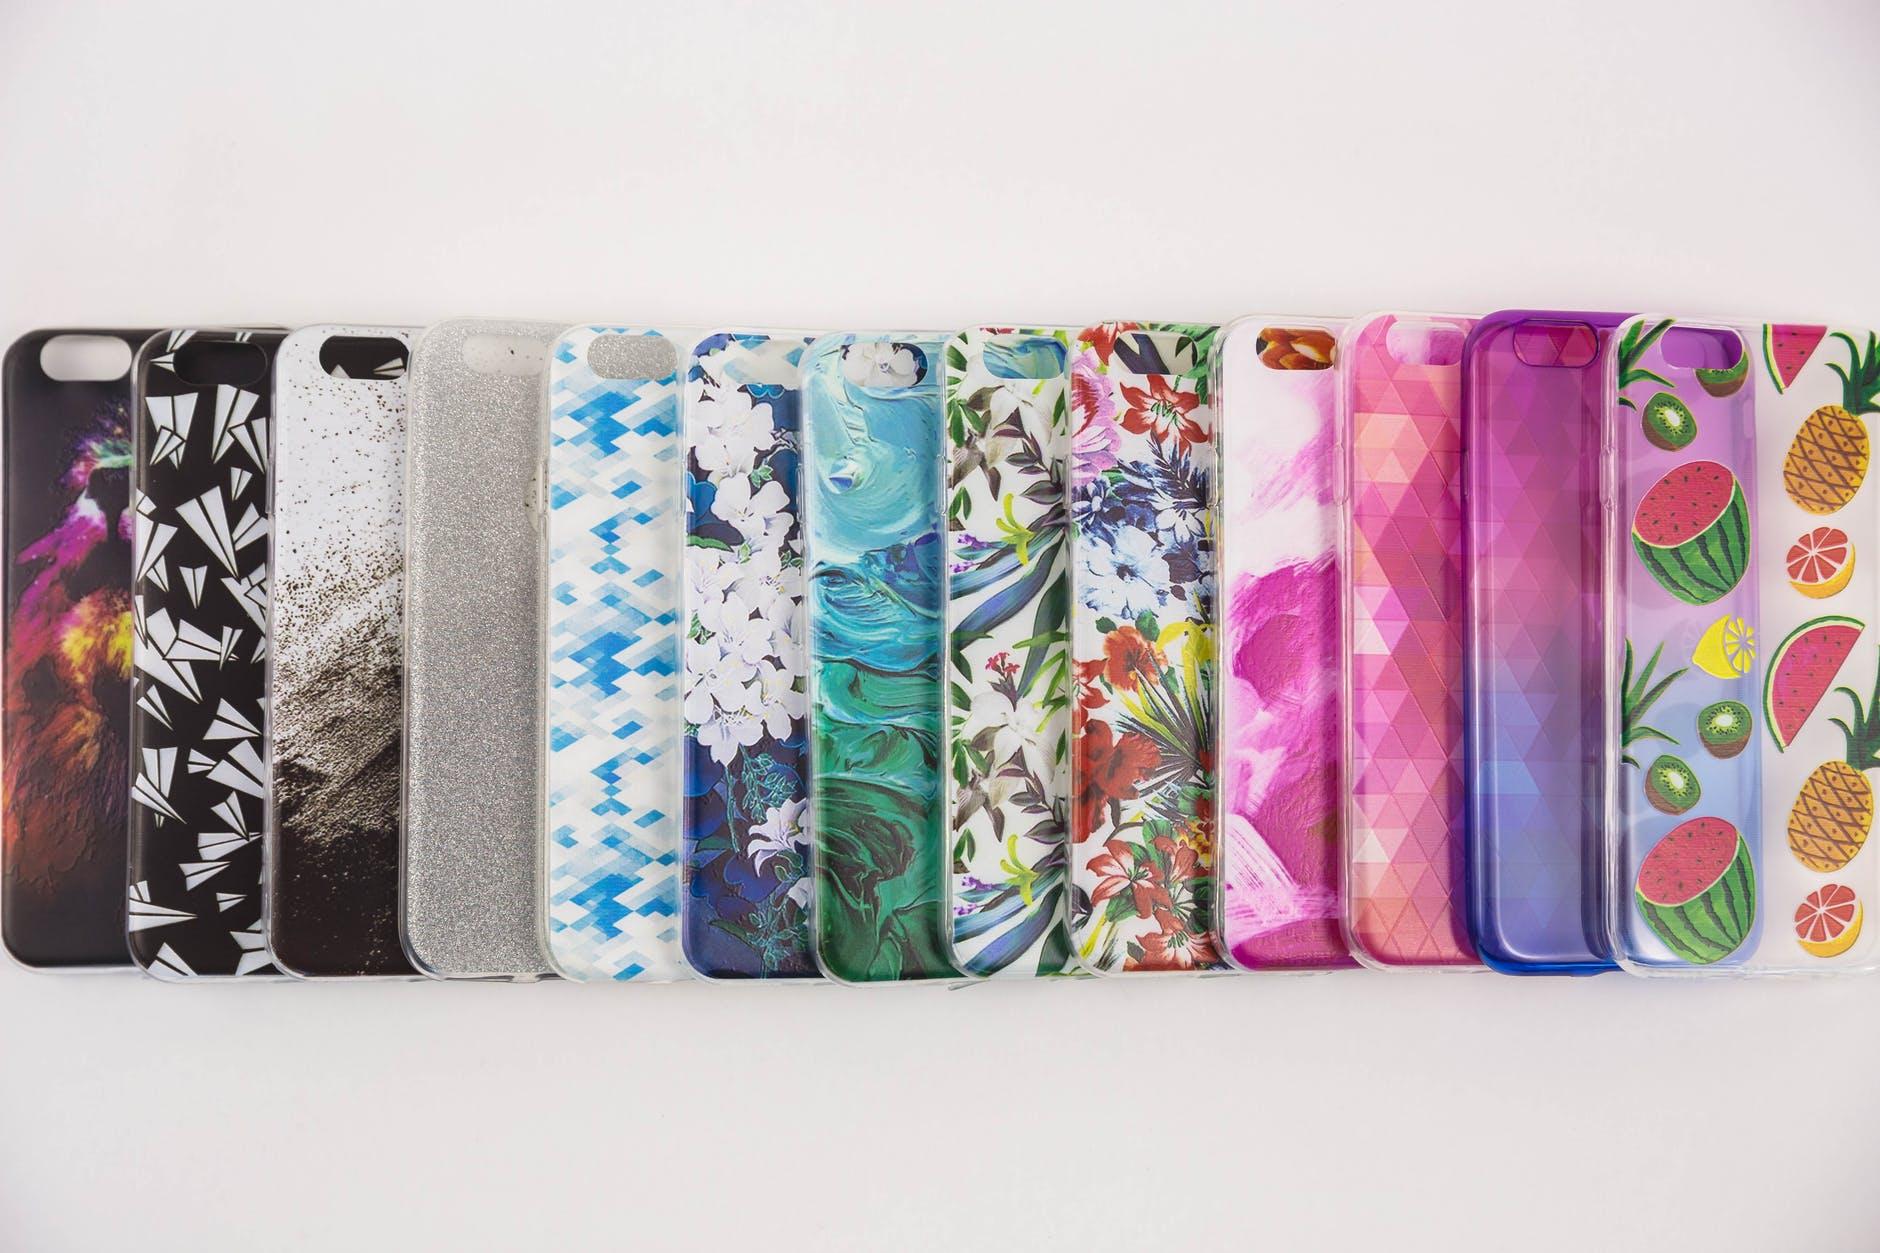 iPhone case colors